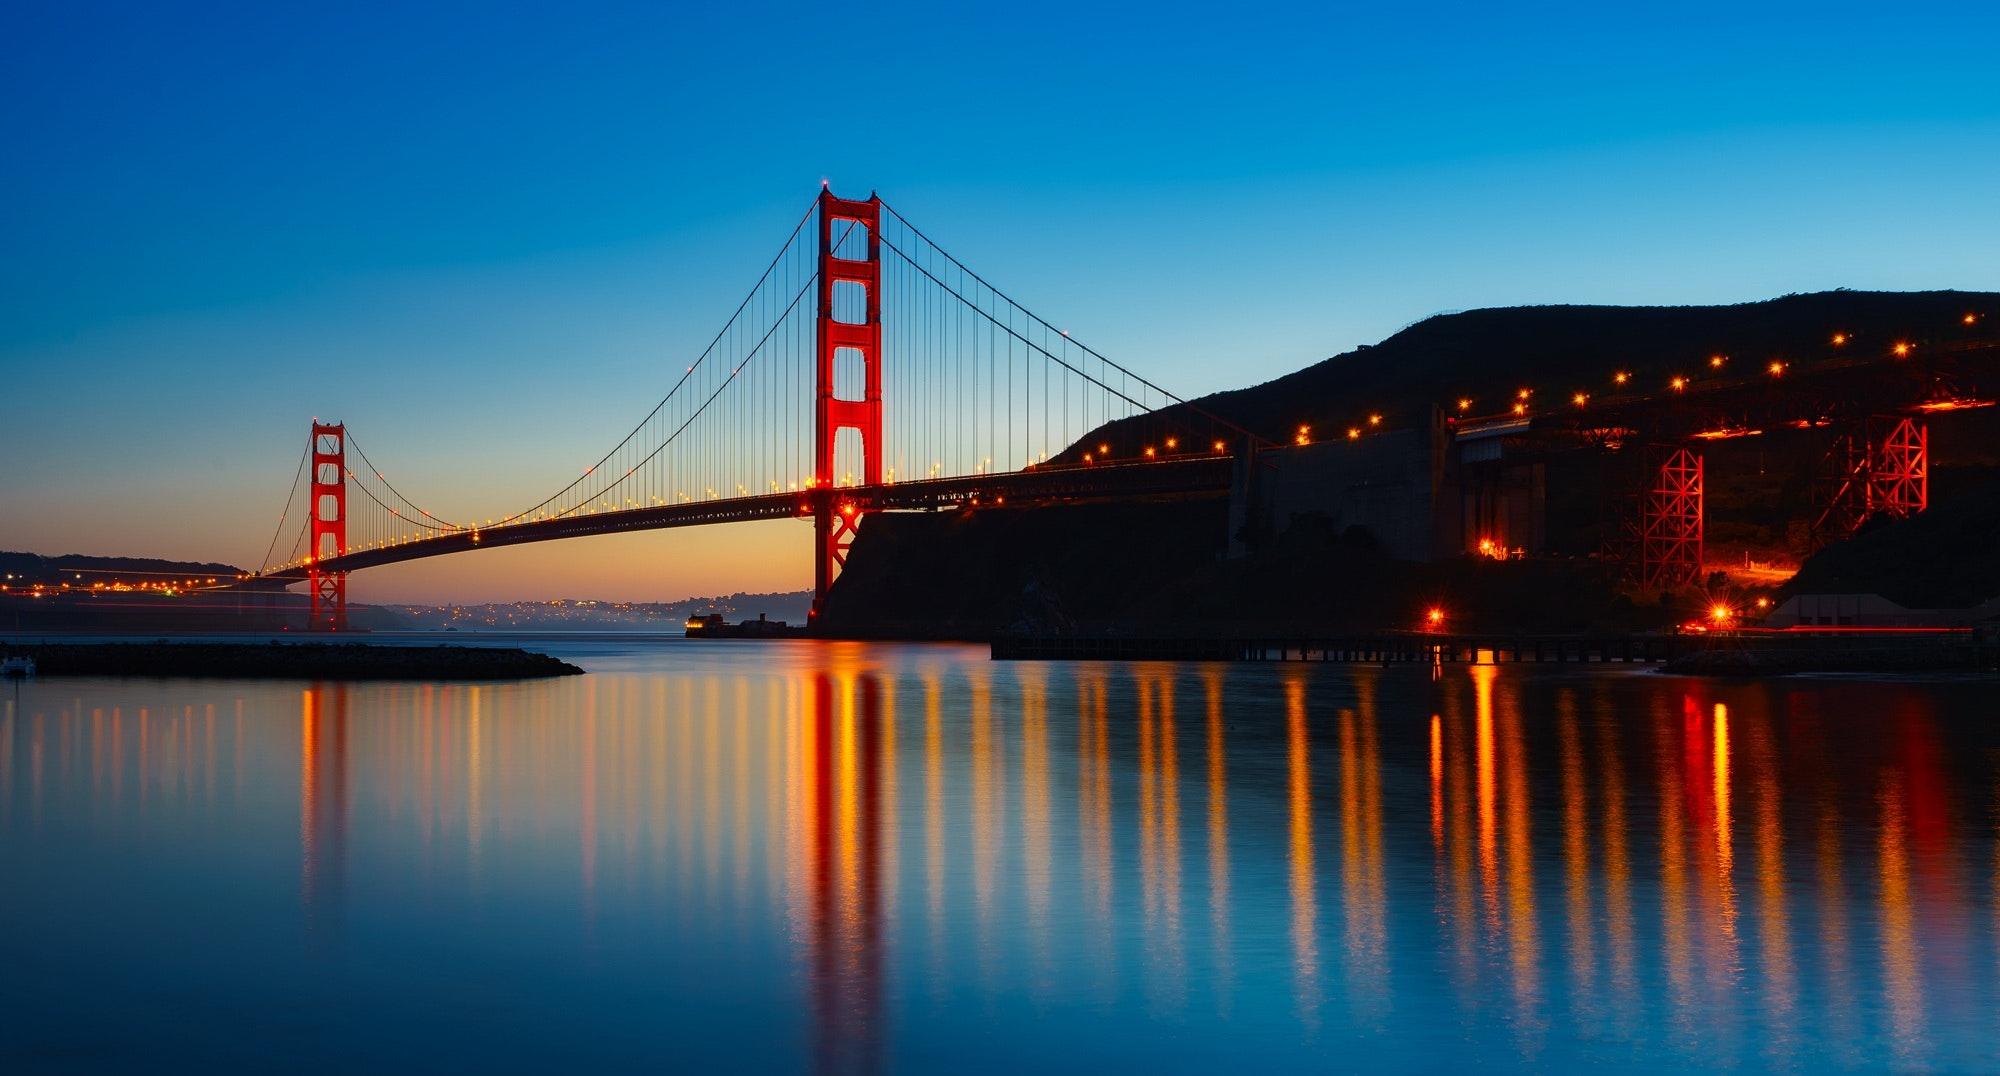 1000 Great Golden Gate Bridge Photos 183 Pexels 183 Free